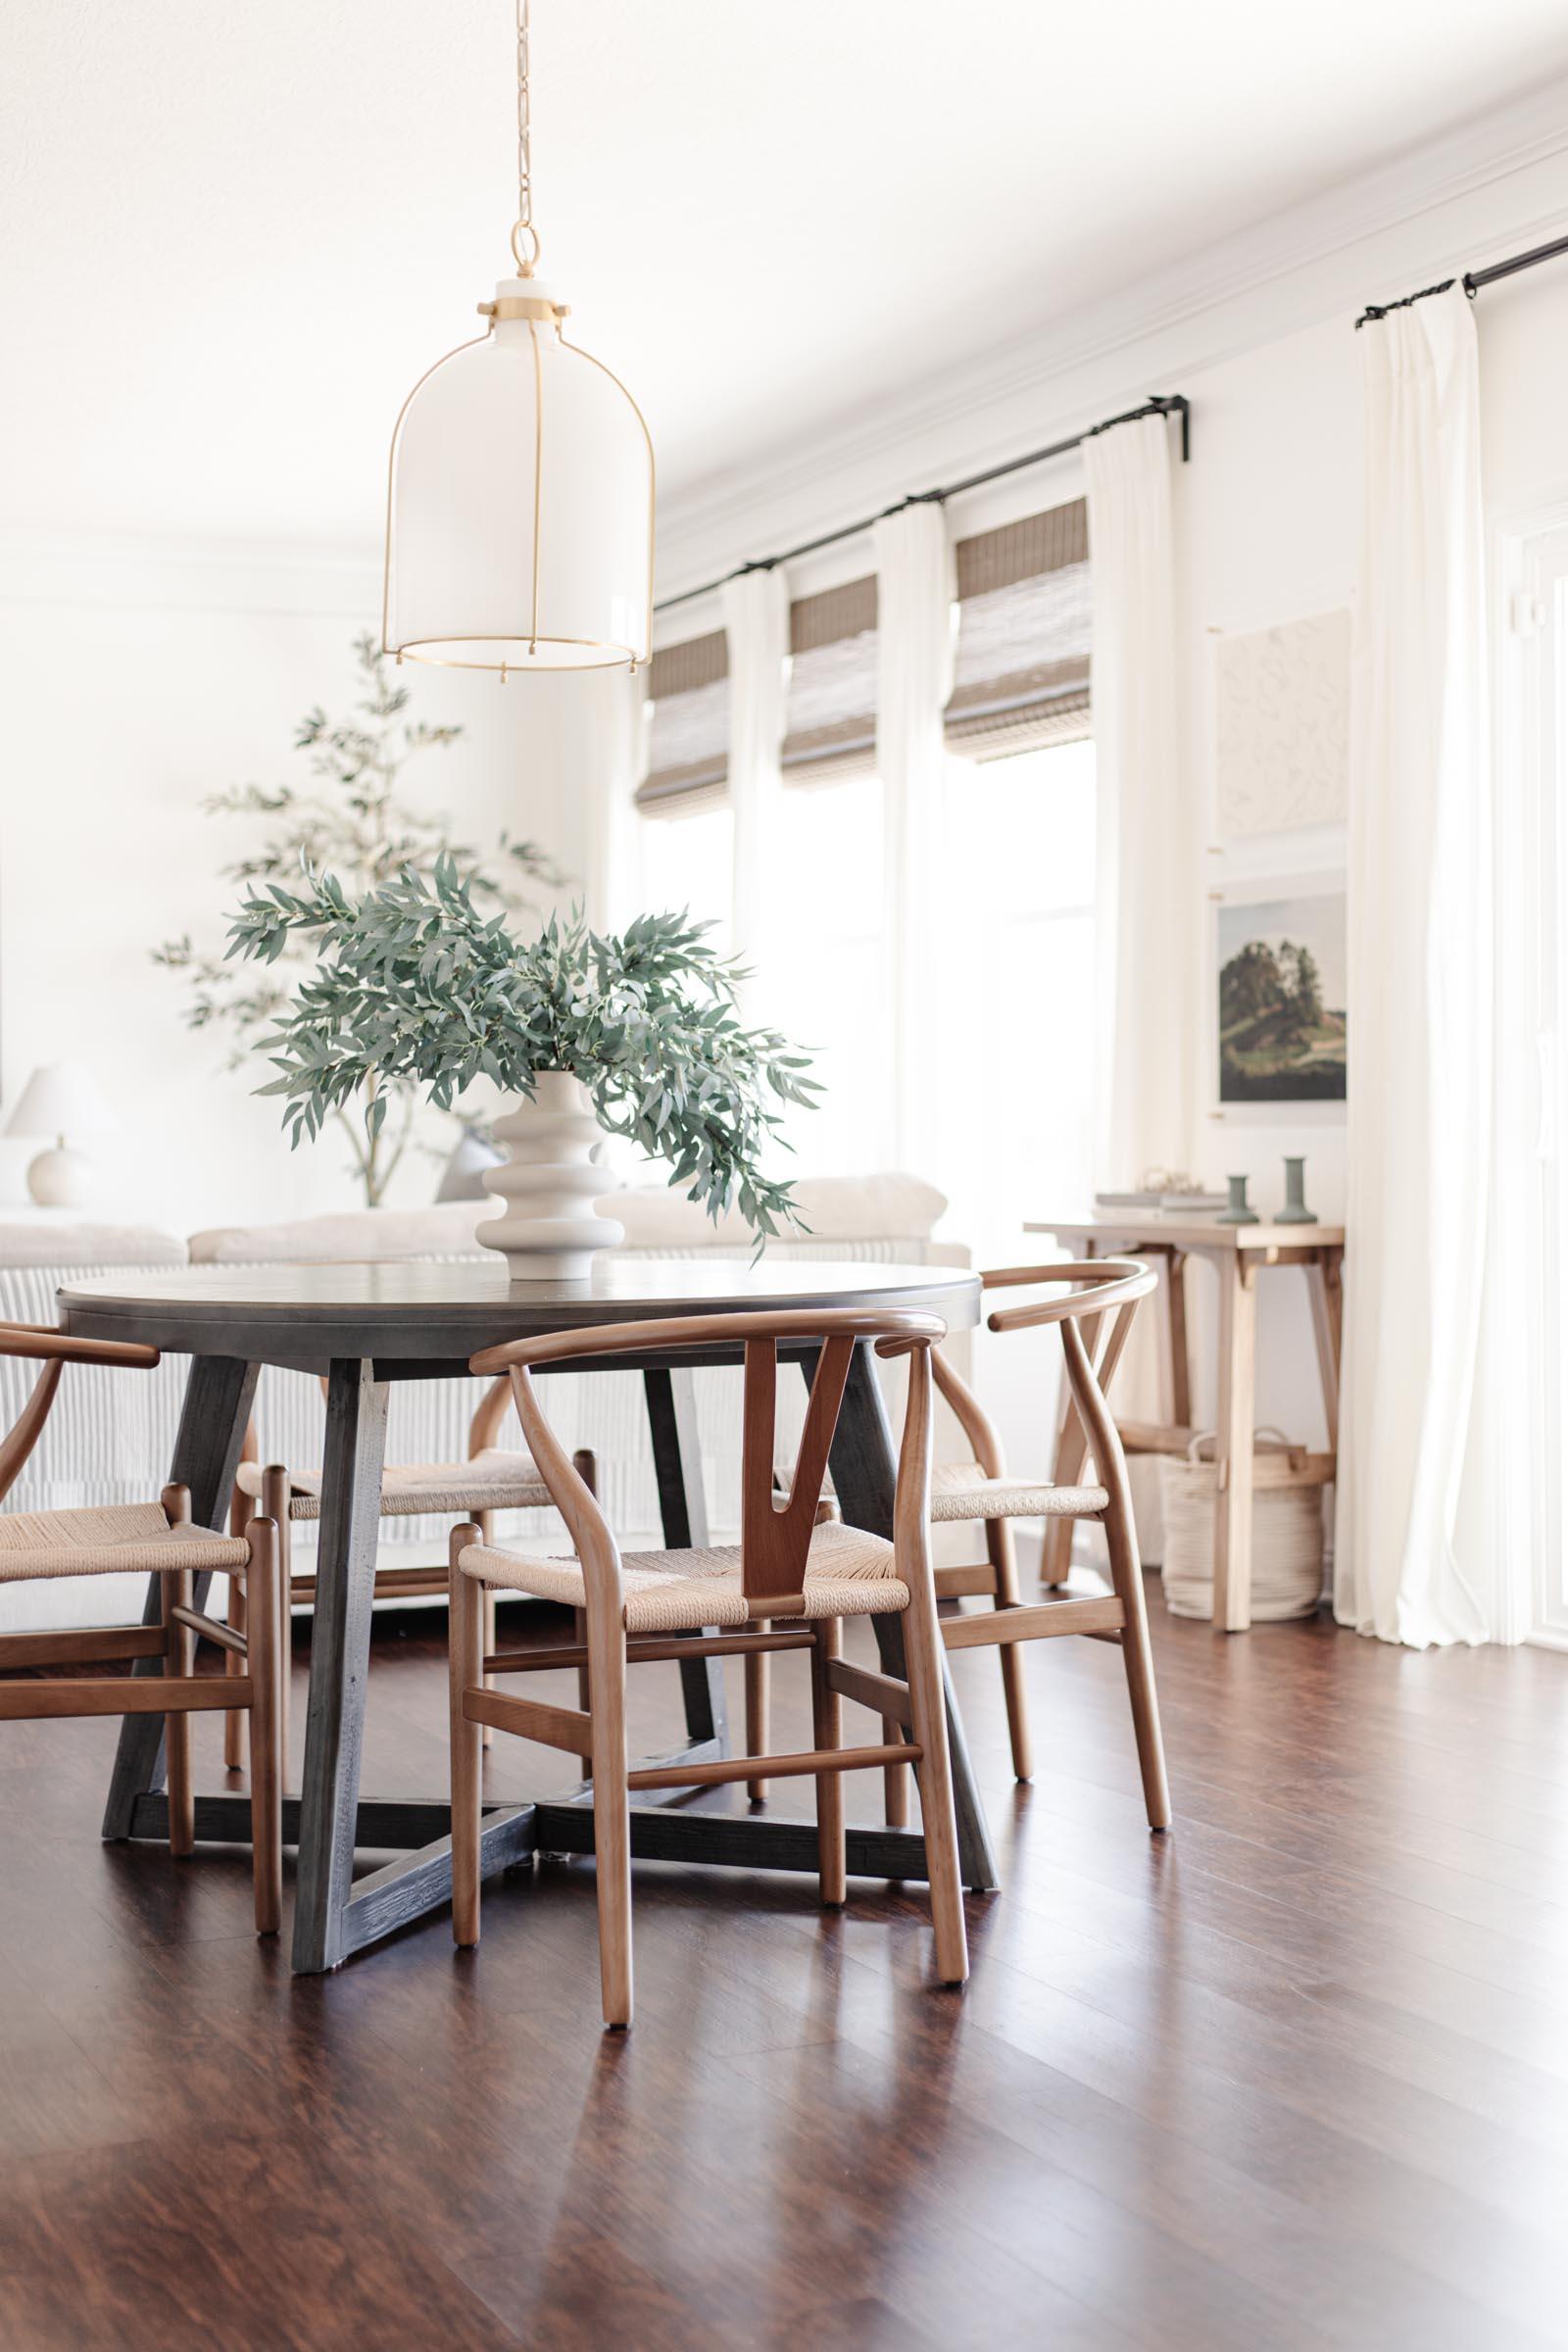 breakfast table, pendant light, bamboo shades